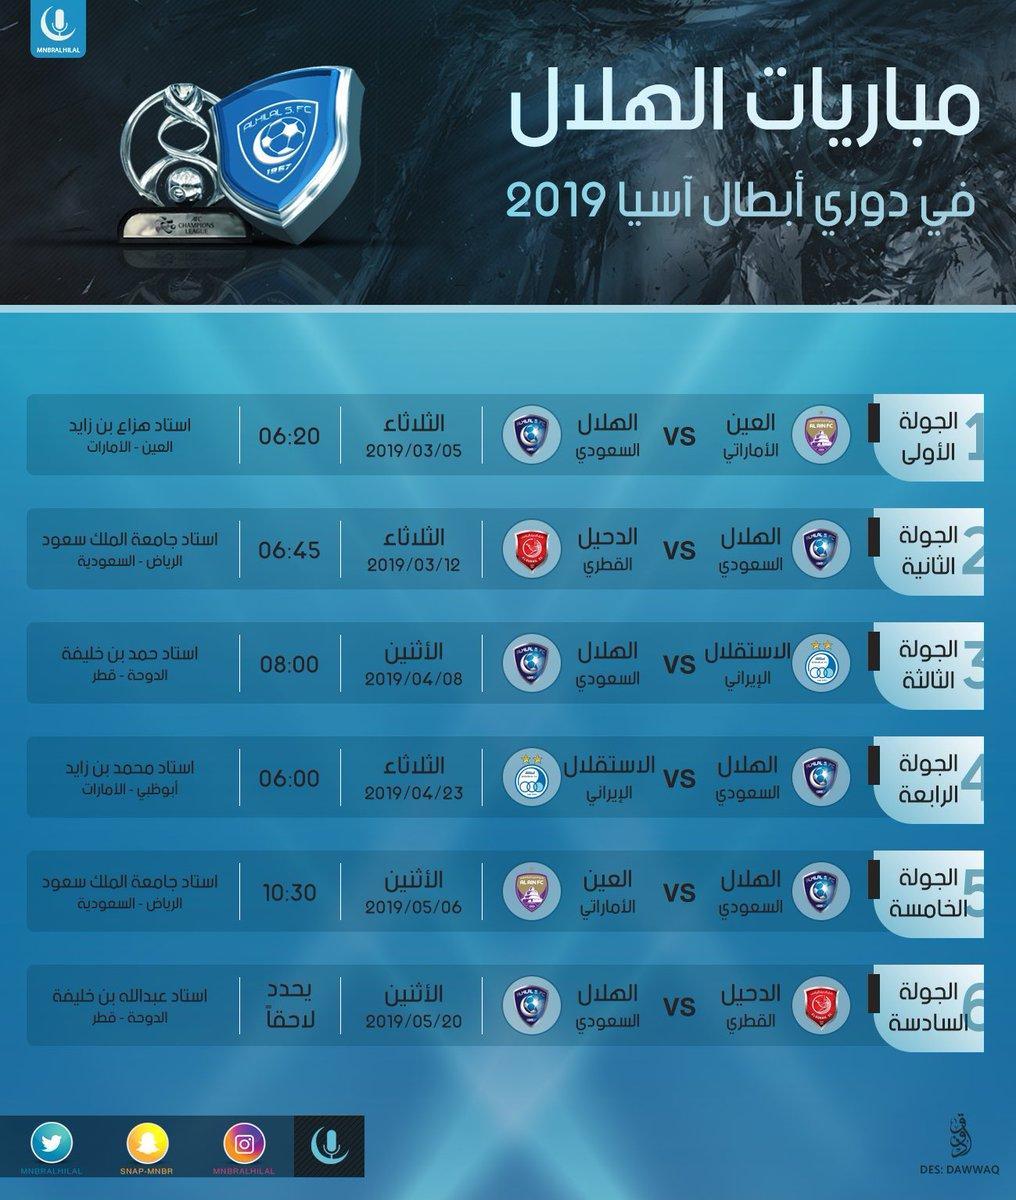 Twitter पर منبر الهلال جدول مباريات في دوري أبطال آسيا